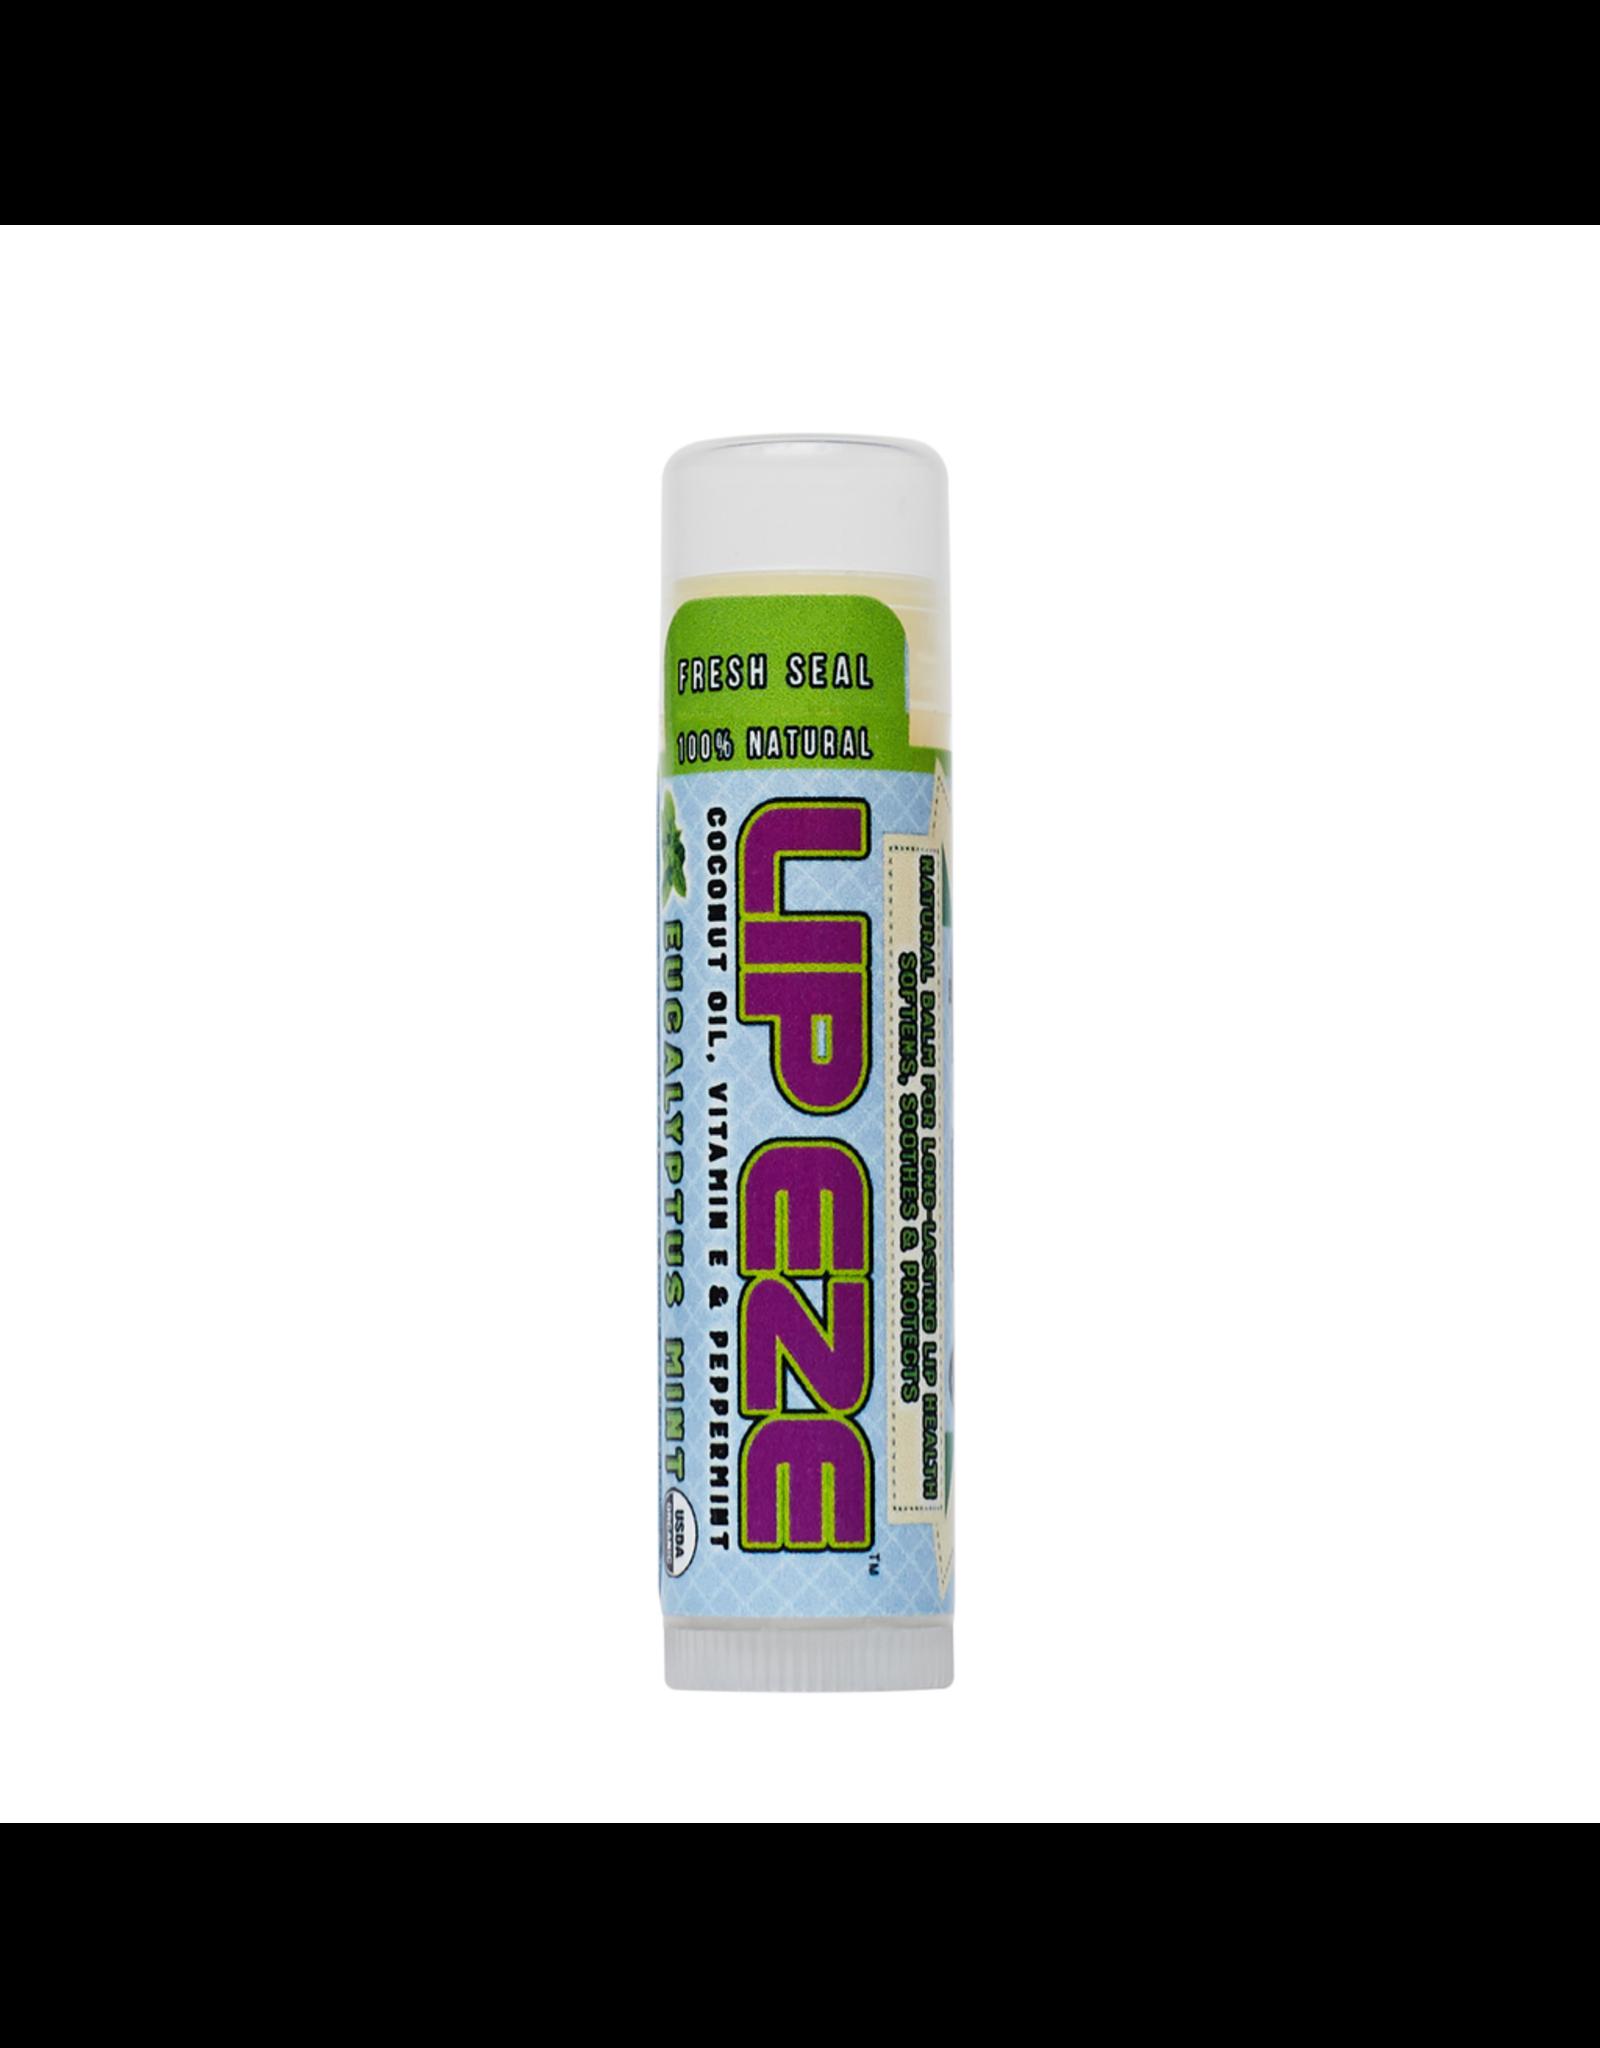 Green Peak Wellness Lip Eze - Eucalyptus Mint Lip Balm